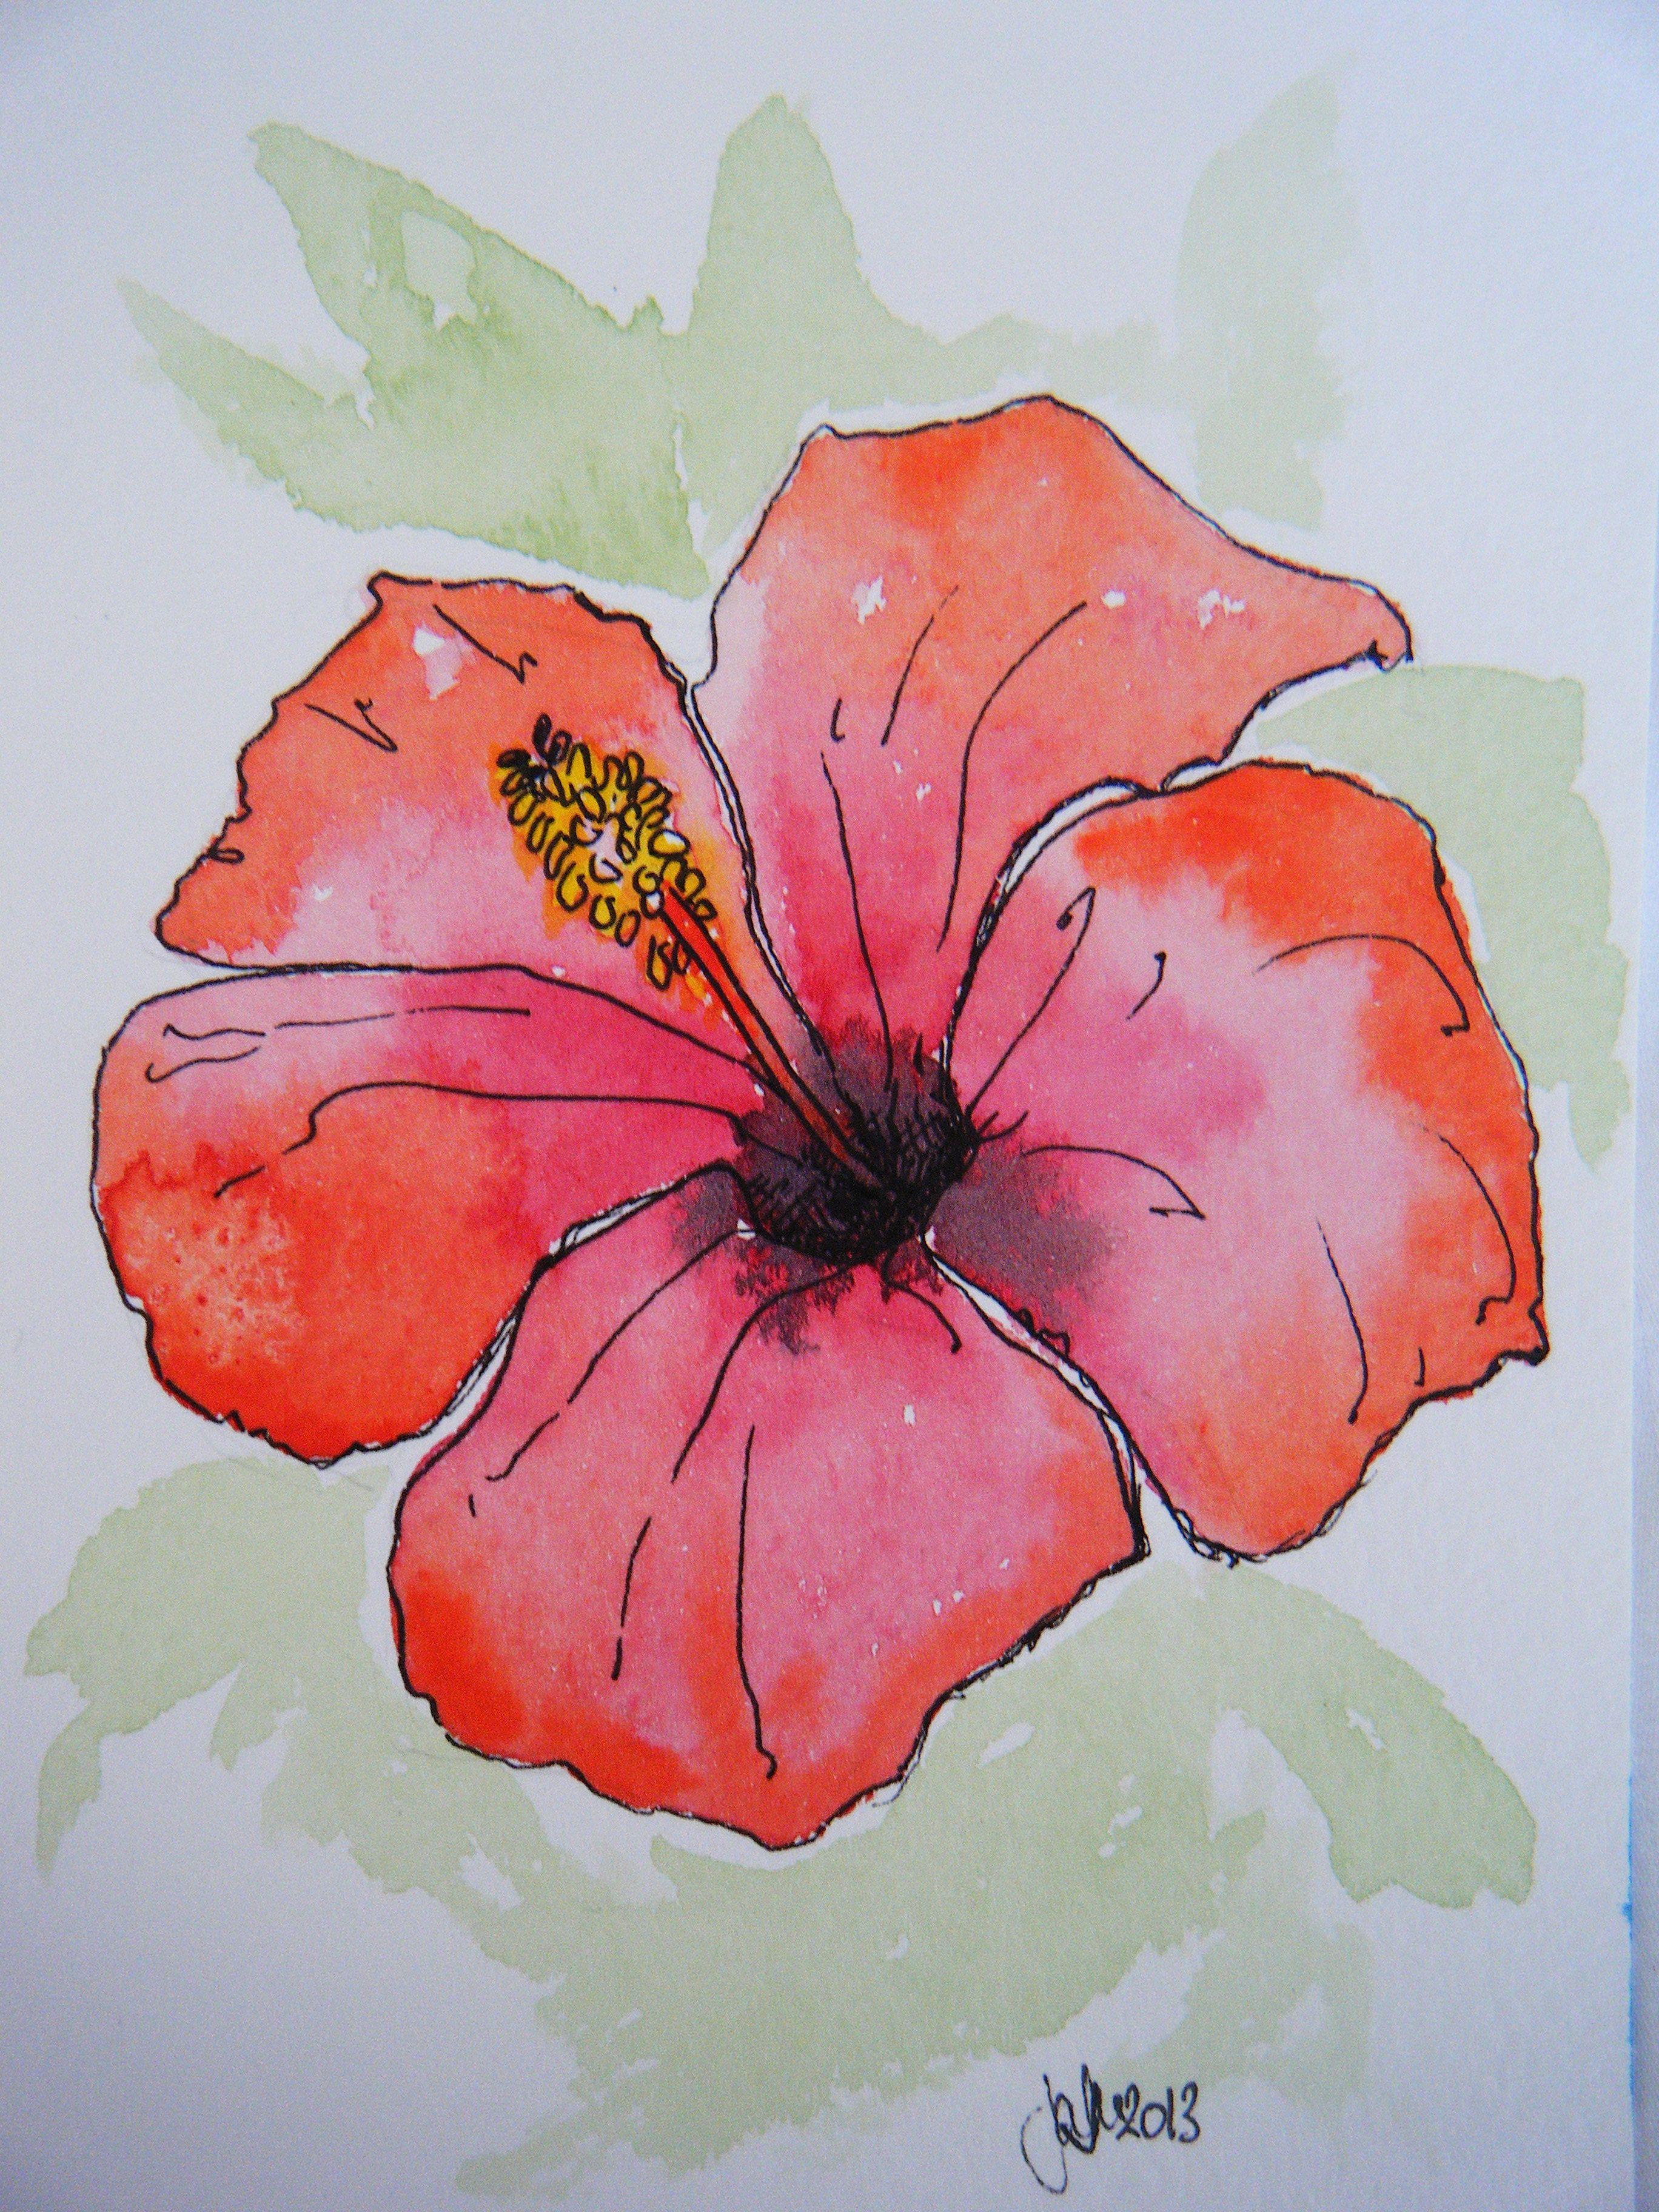 Jakeart1 Artist Commissions Unique Gift Ideas Flower Painting Watercolor Flowers Watercolor Art